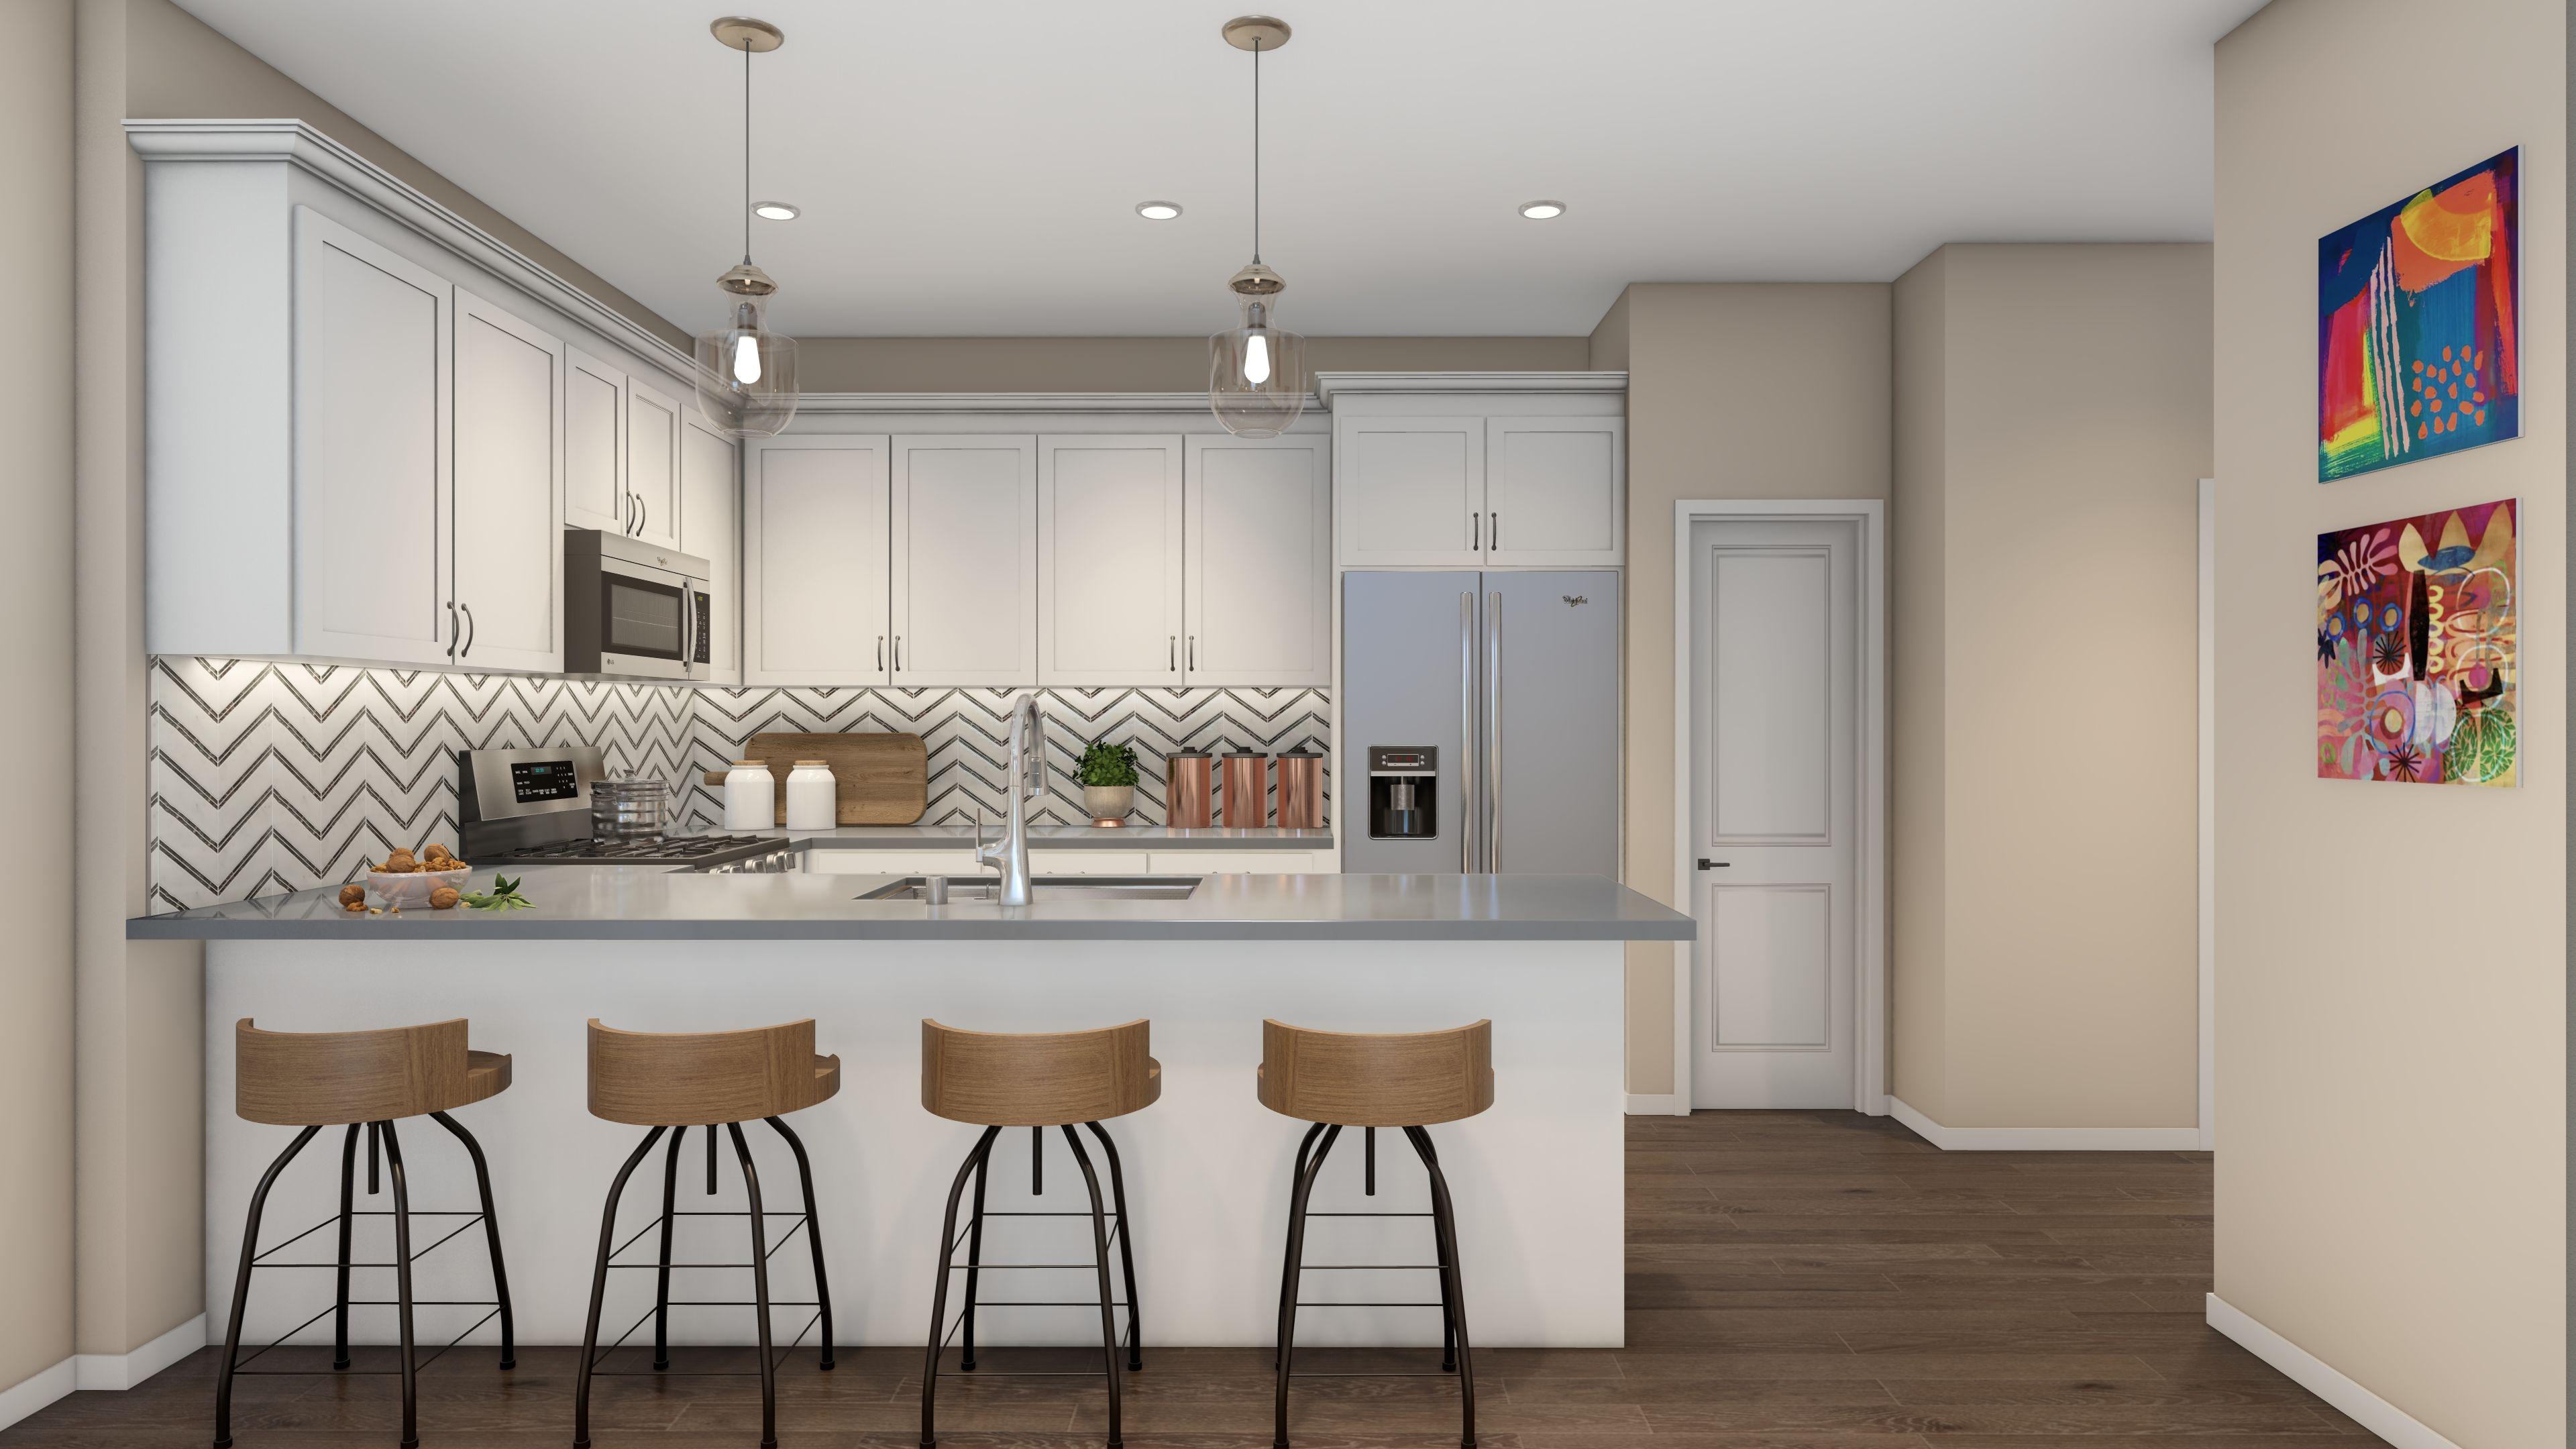 Kitchen featured in the Plan 2 By R at Righetti in San Luis Obispo, CA